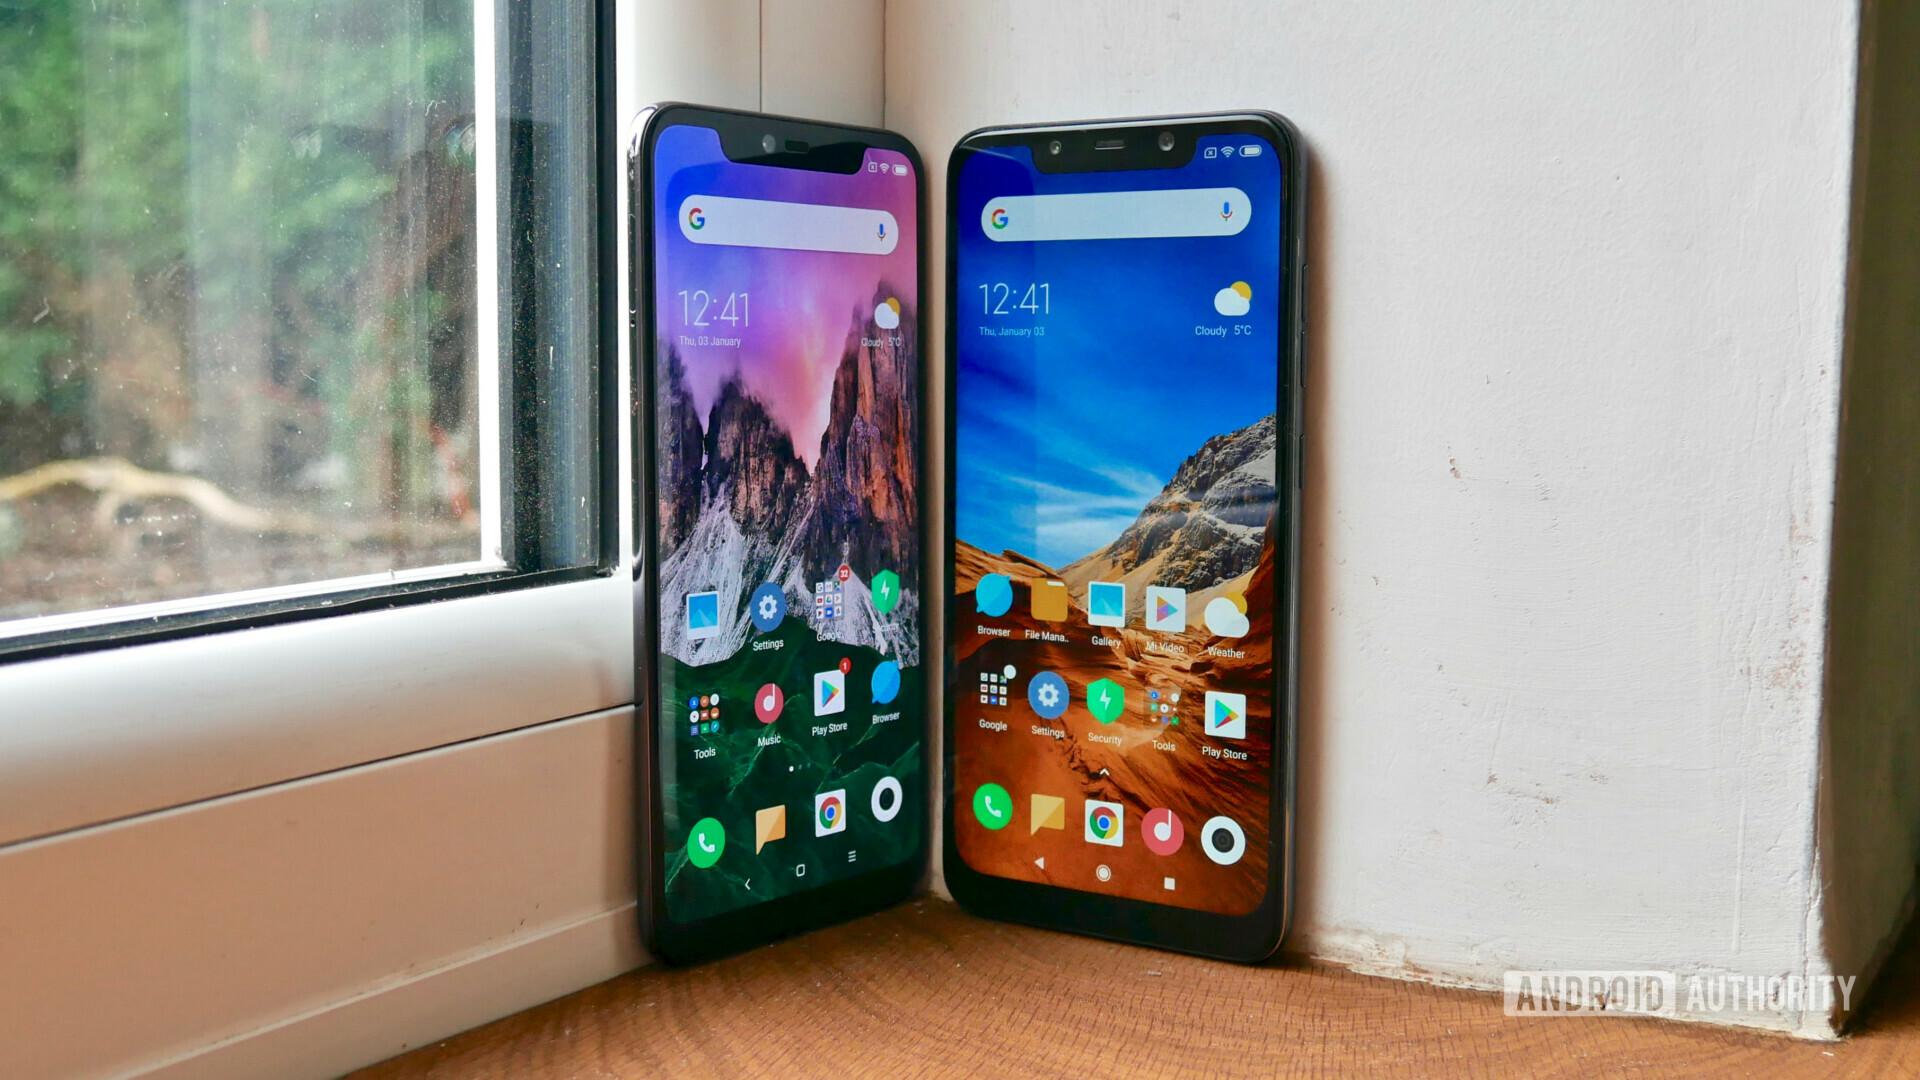 Xiaomi Mi 8 Pro vs Pocophone F1